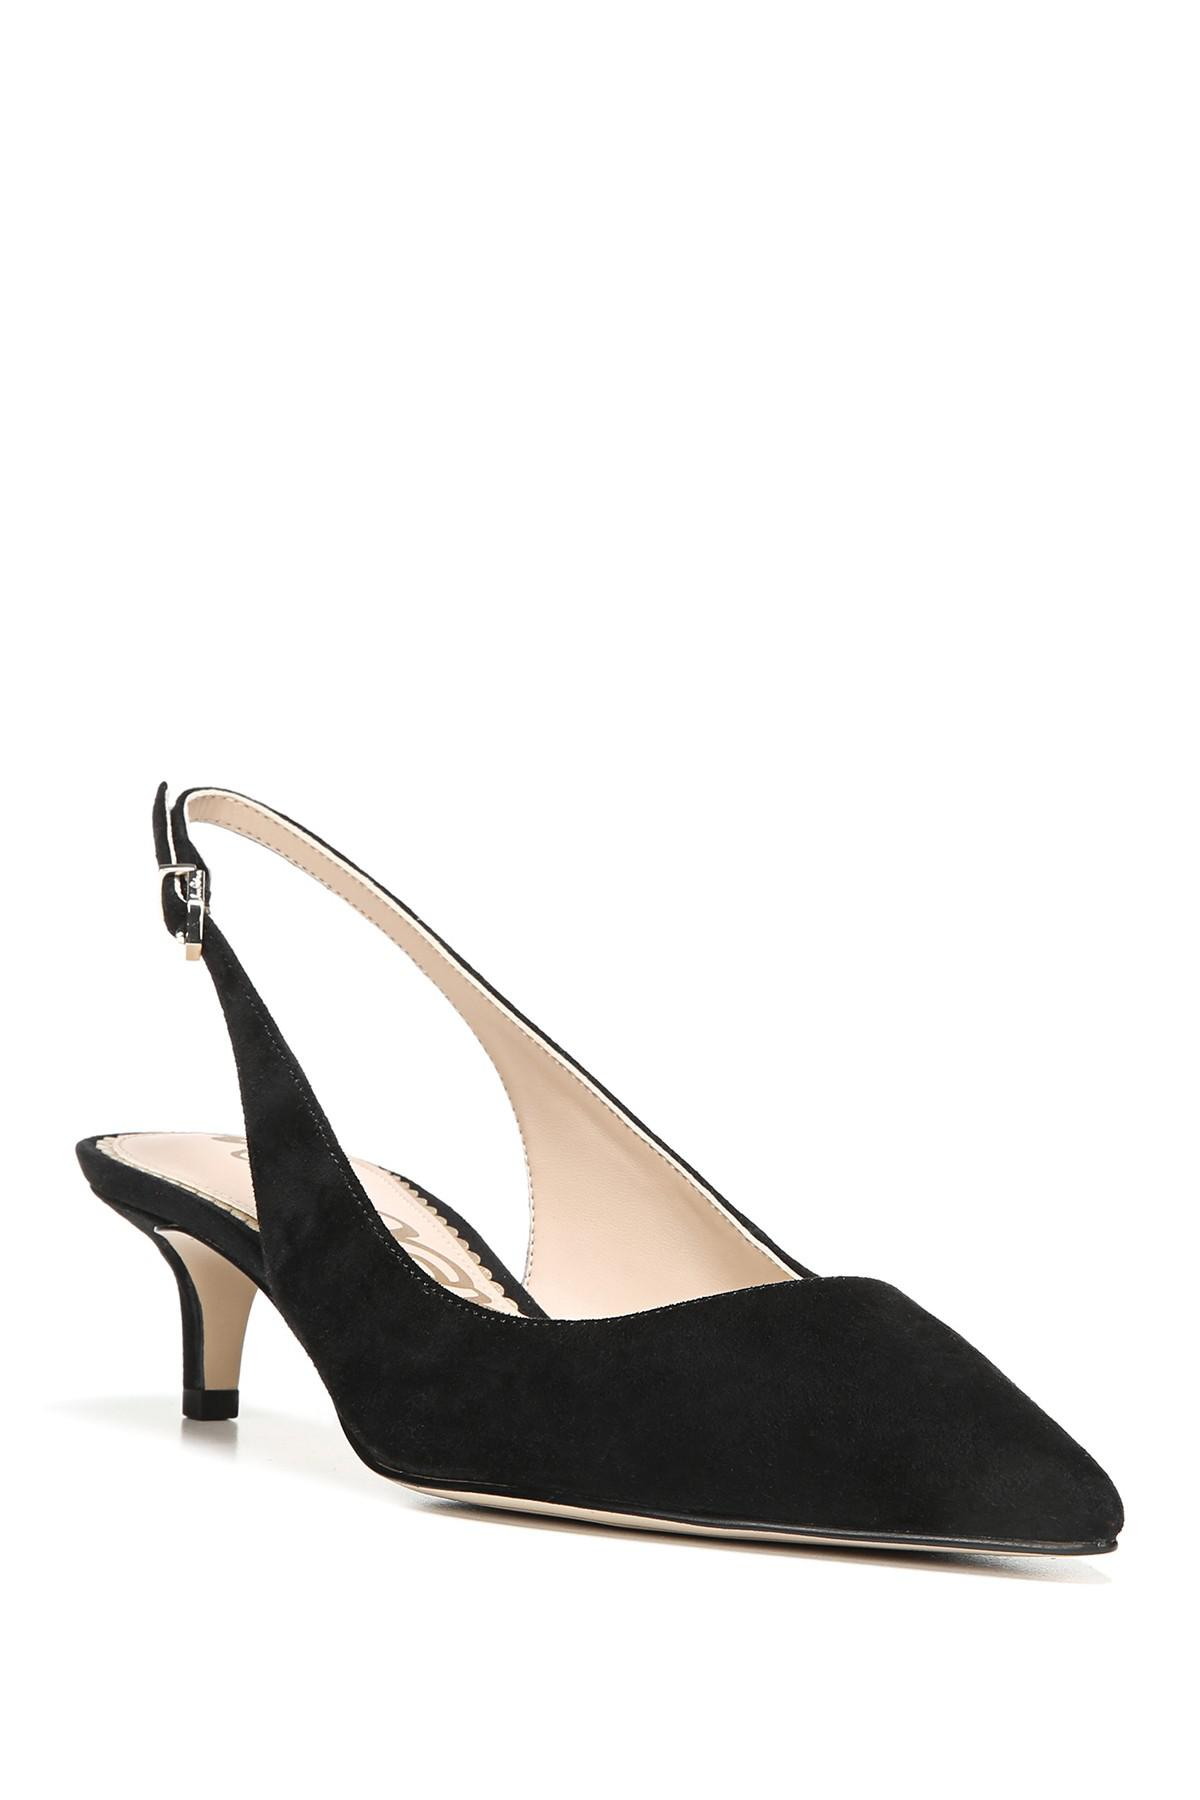 85a40827e9bd96 Lyst - Sam Edelman Ludlow Slingback Pump (women) in Black